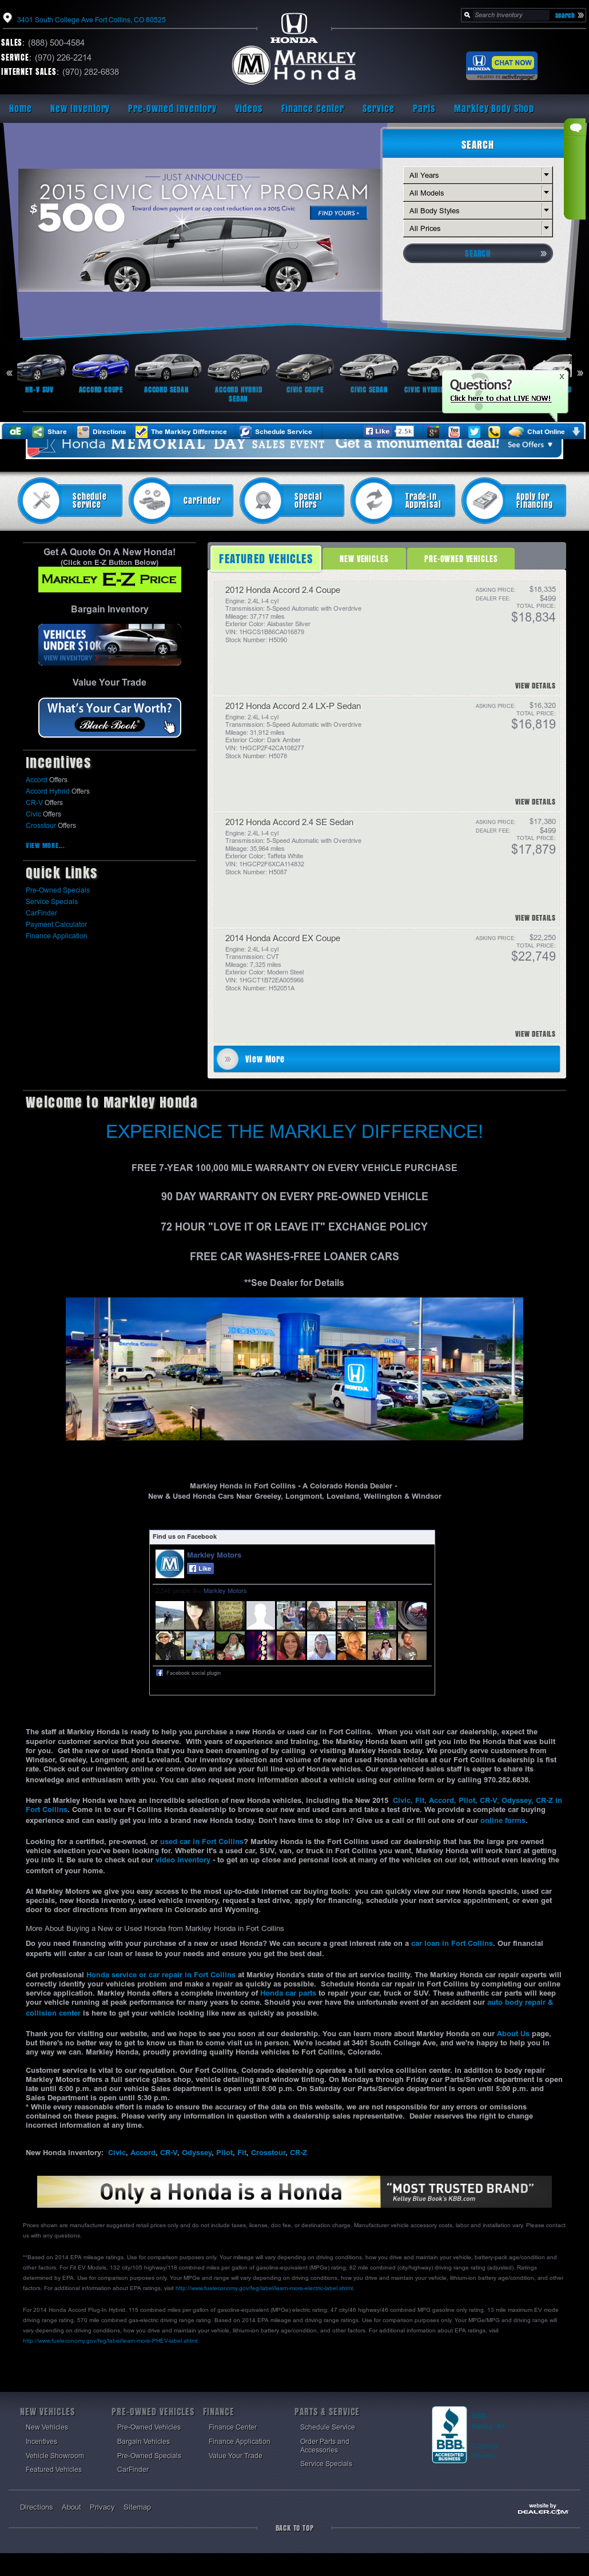 Hondas For Sale By Owner >> Markley Motors Fort Collins Colorado - impremedia.net